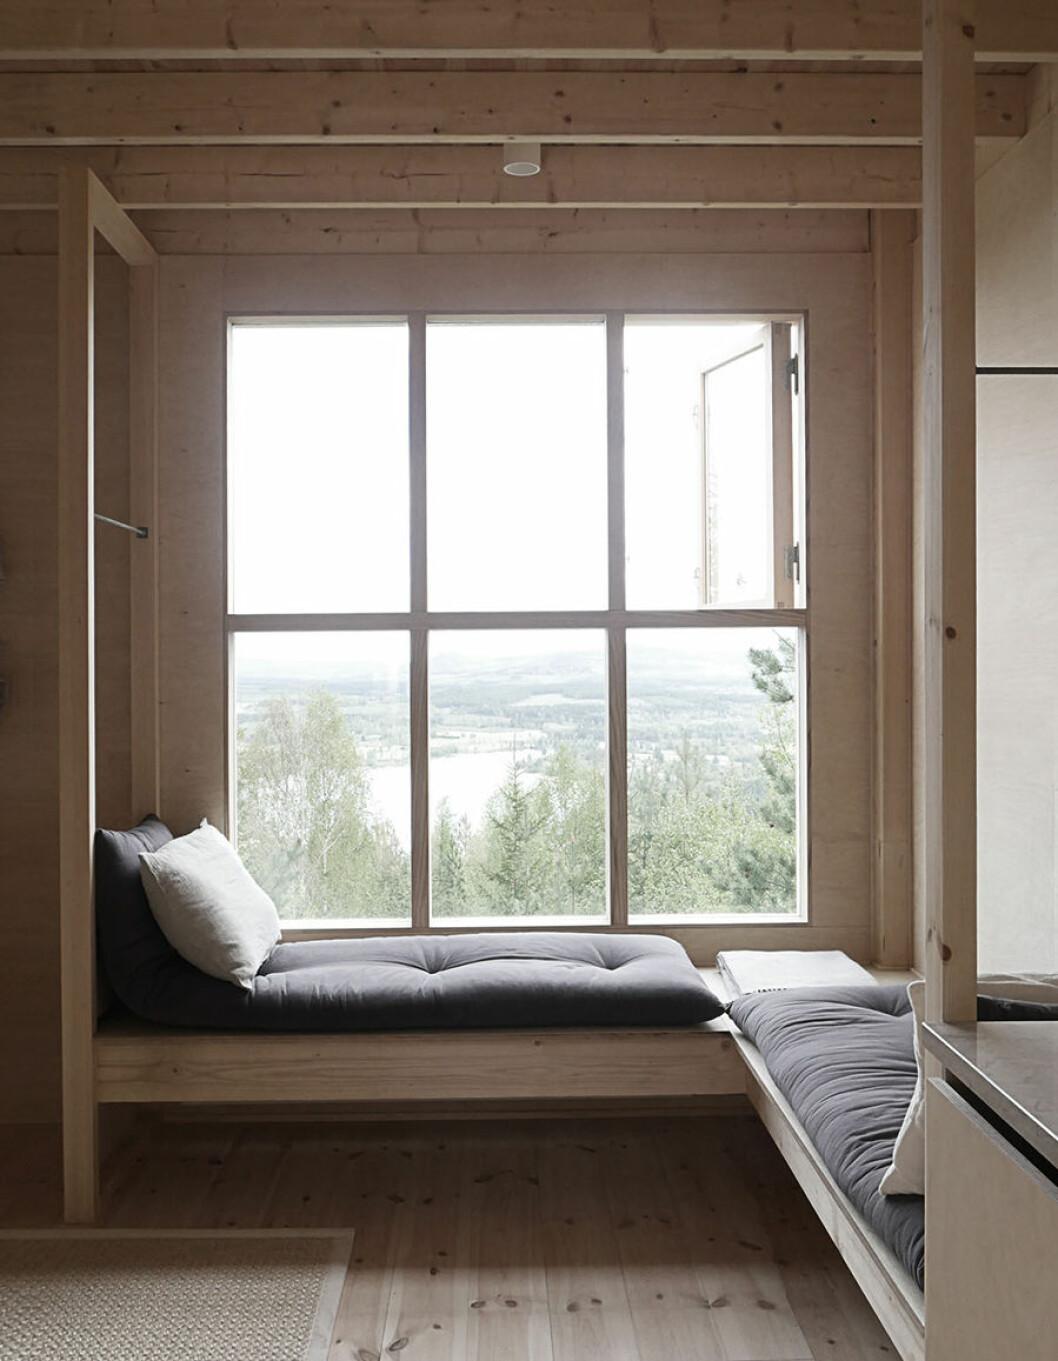 lofthuset fönsterbänk2